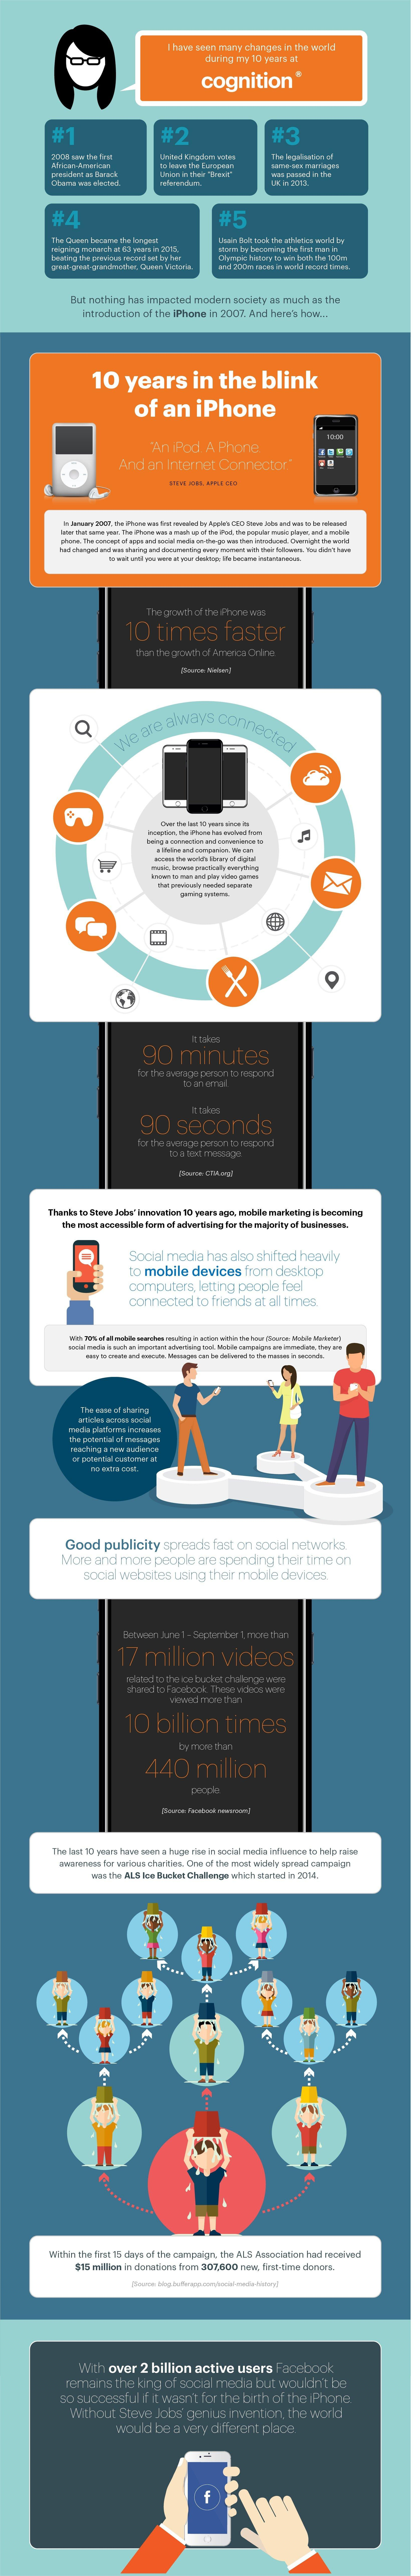 10yrs iPhone infographic_SEPT.jpg